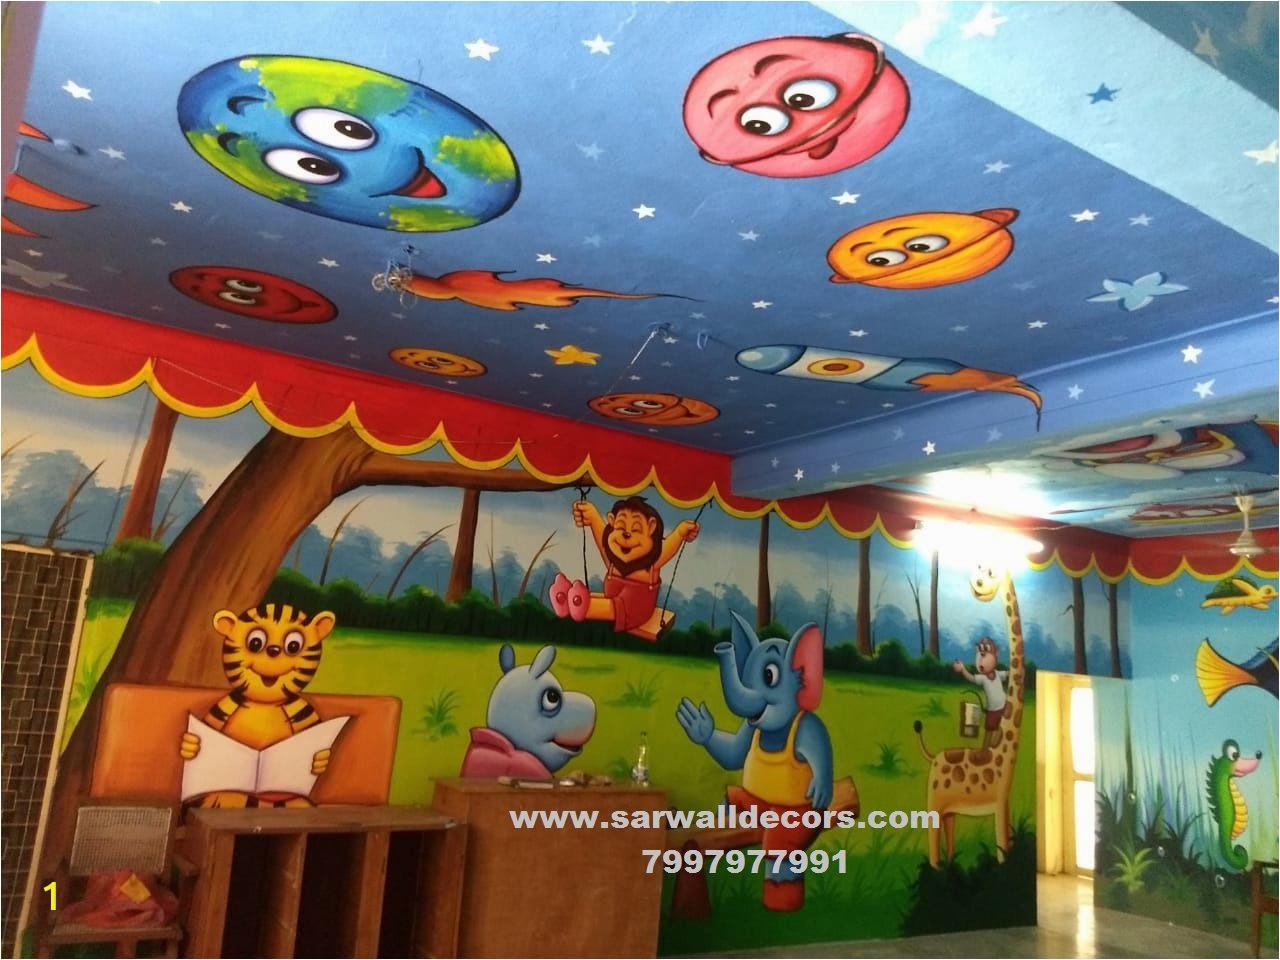 Wall Murals In Hyderabad Primary School Wall Paintings Hyderabad Nursery School Wall